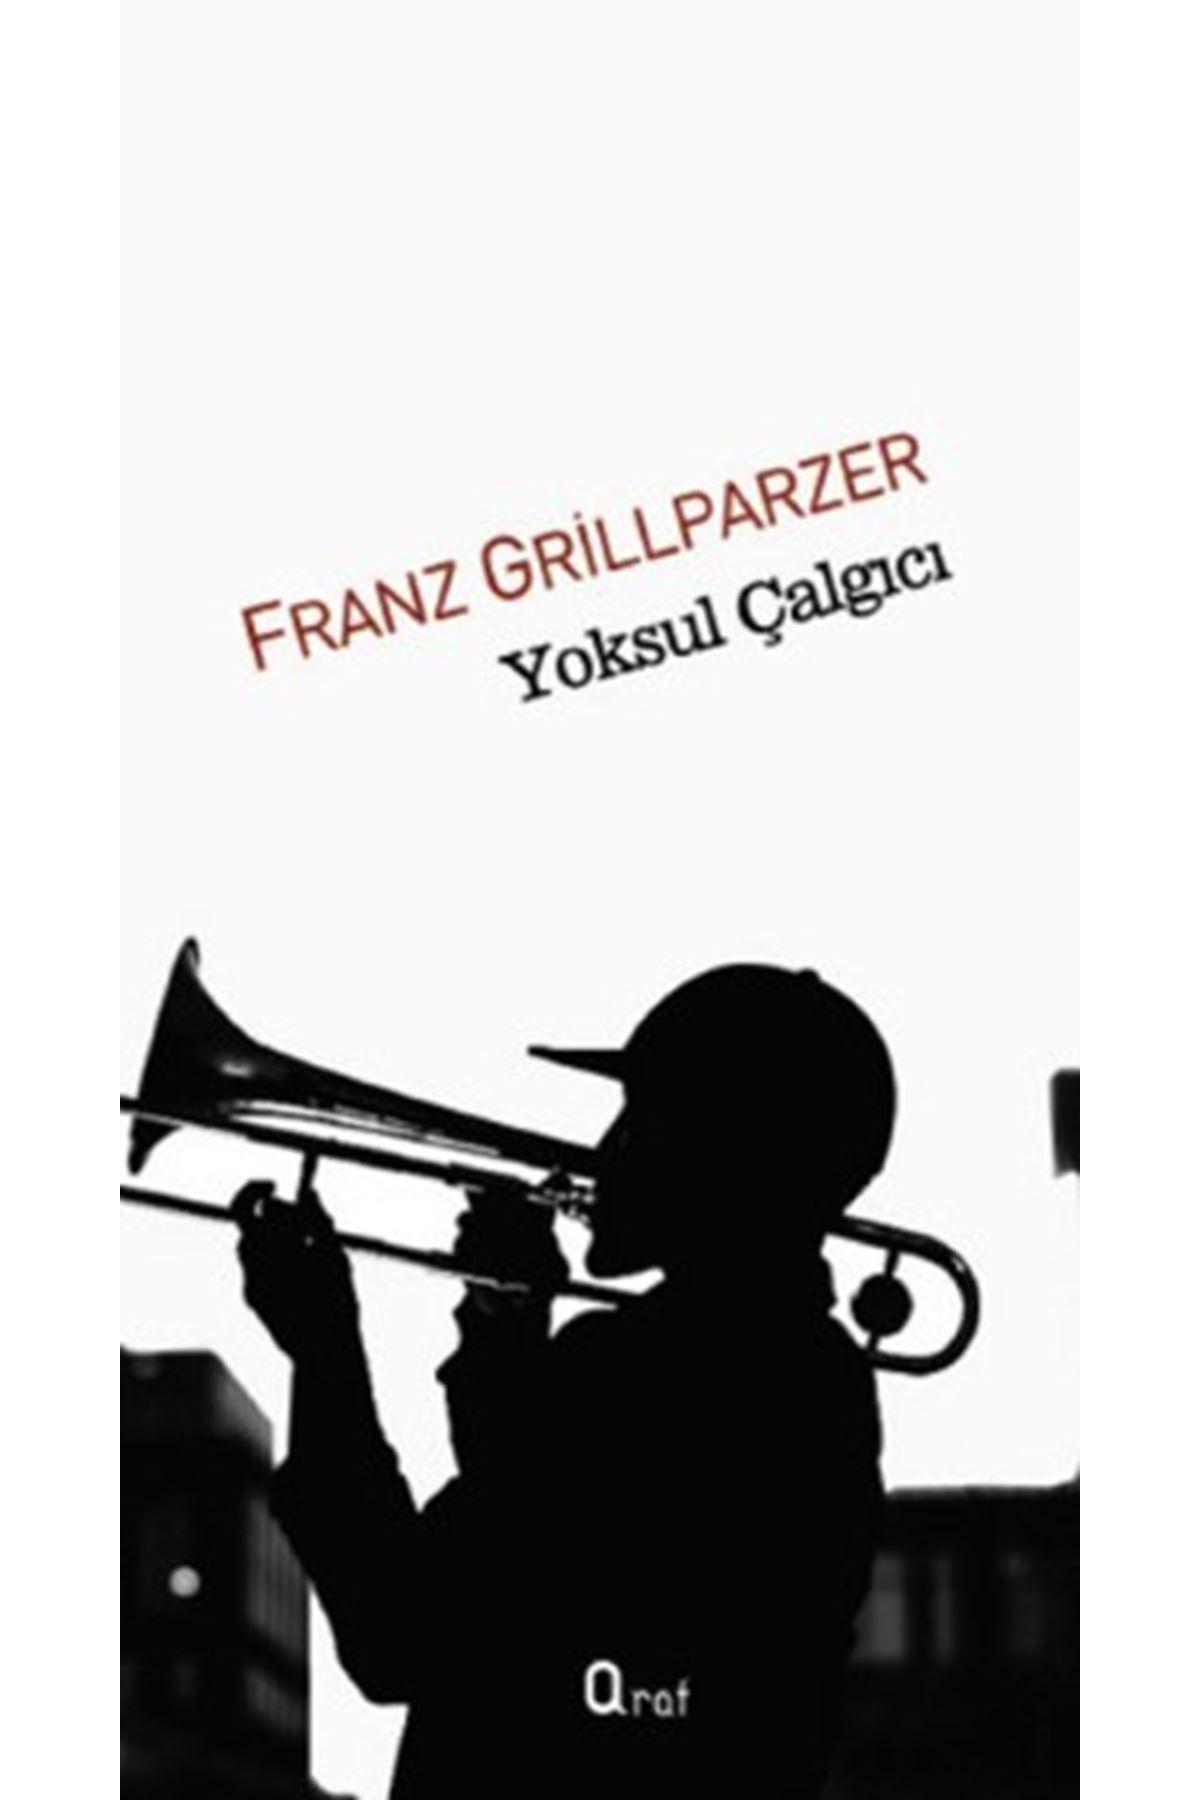 FRANZ GRİLLPARZER - YOKSUL ÇALGICI